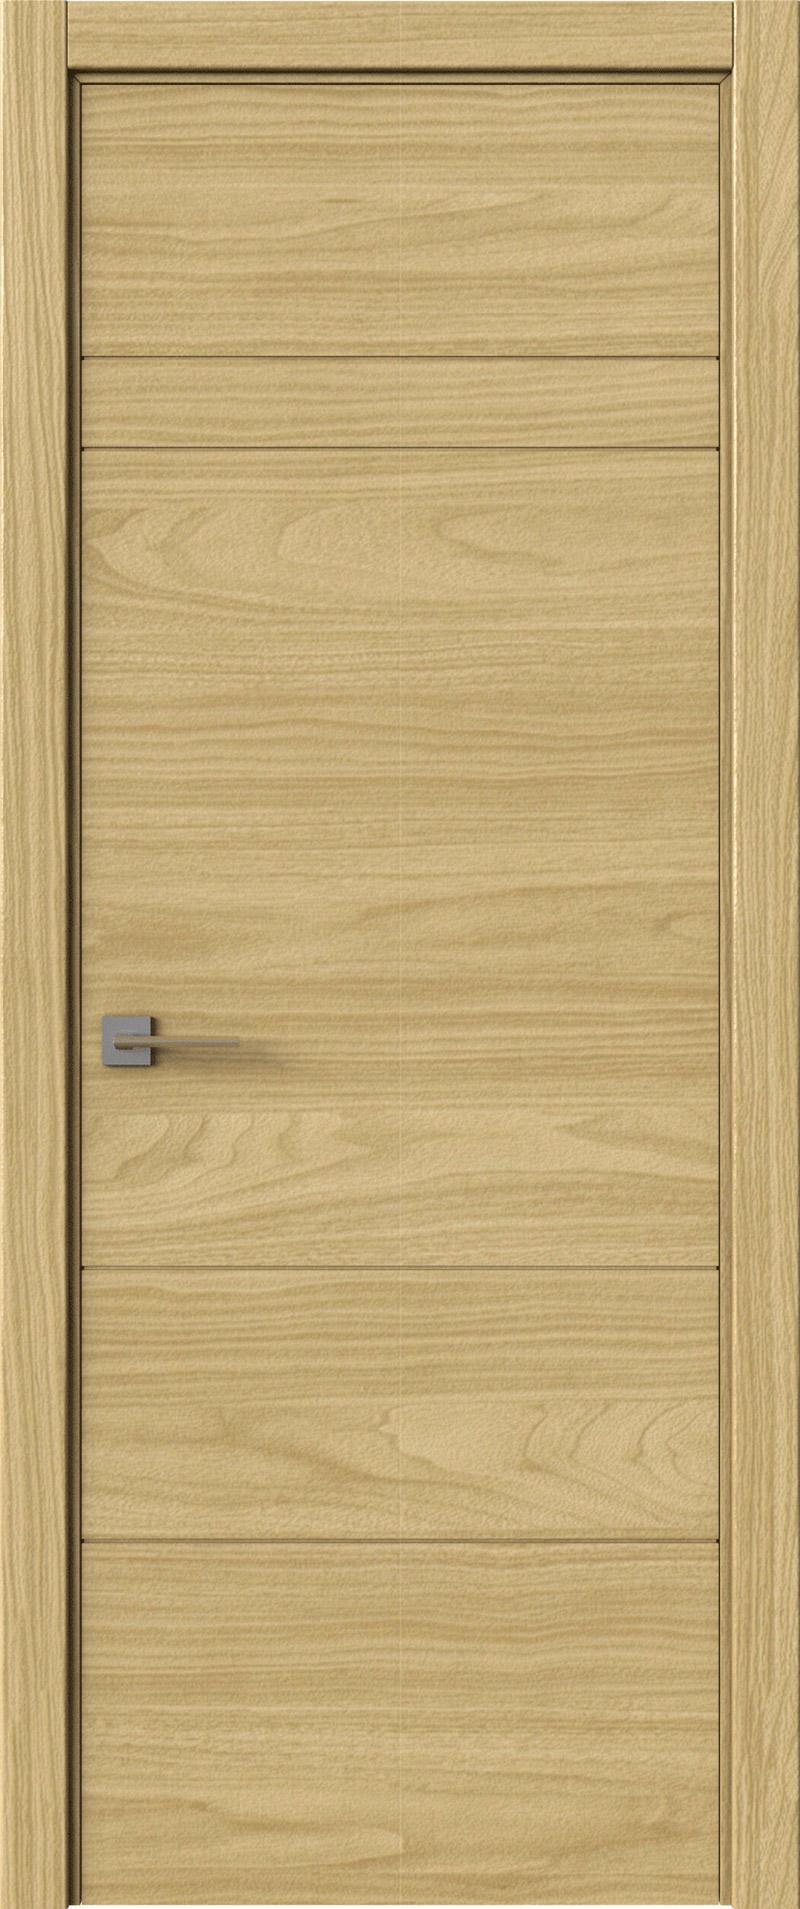 Tivoli К-2 цвет - Дуб нордик Без стекла (ДГ)